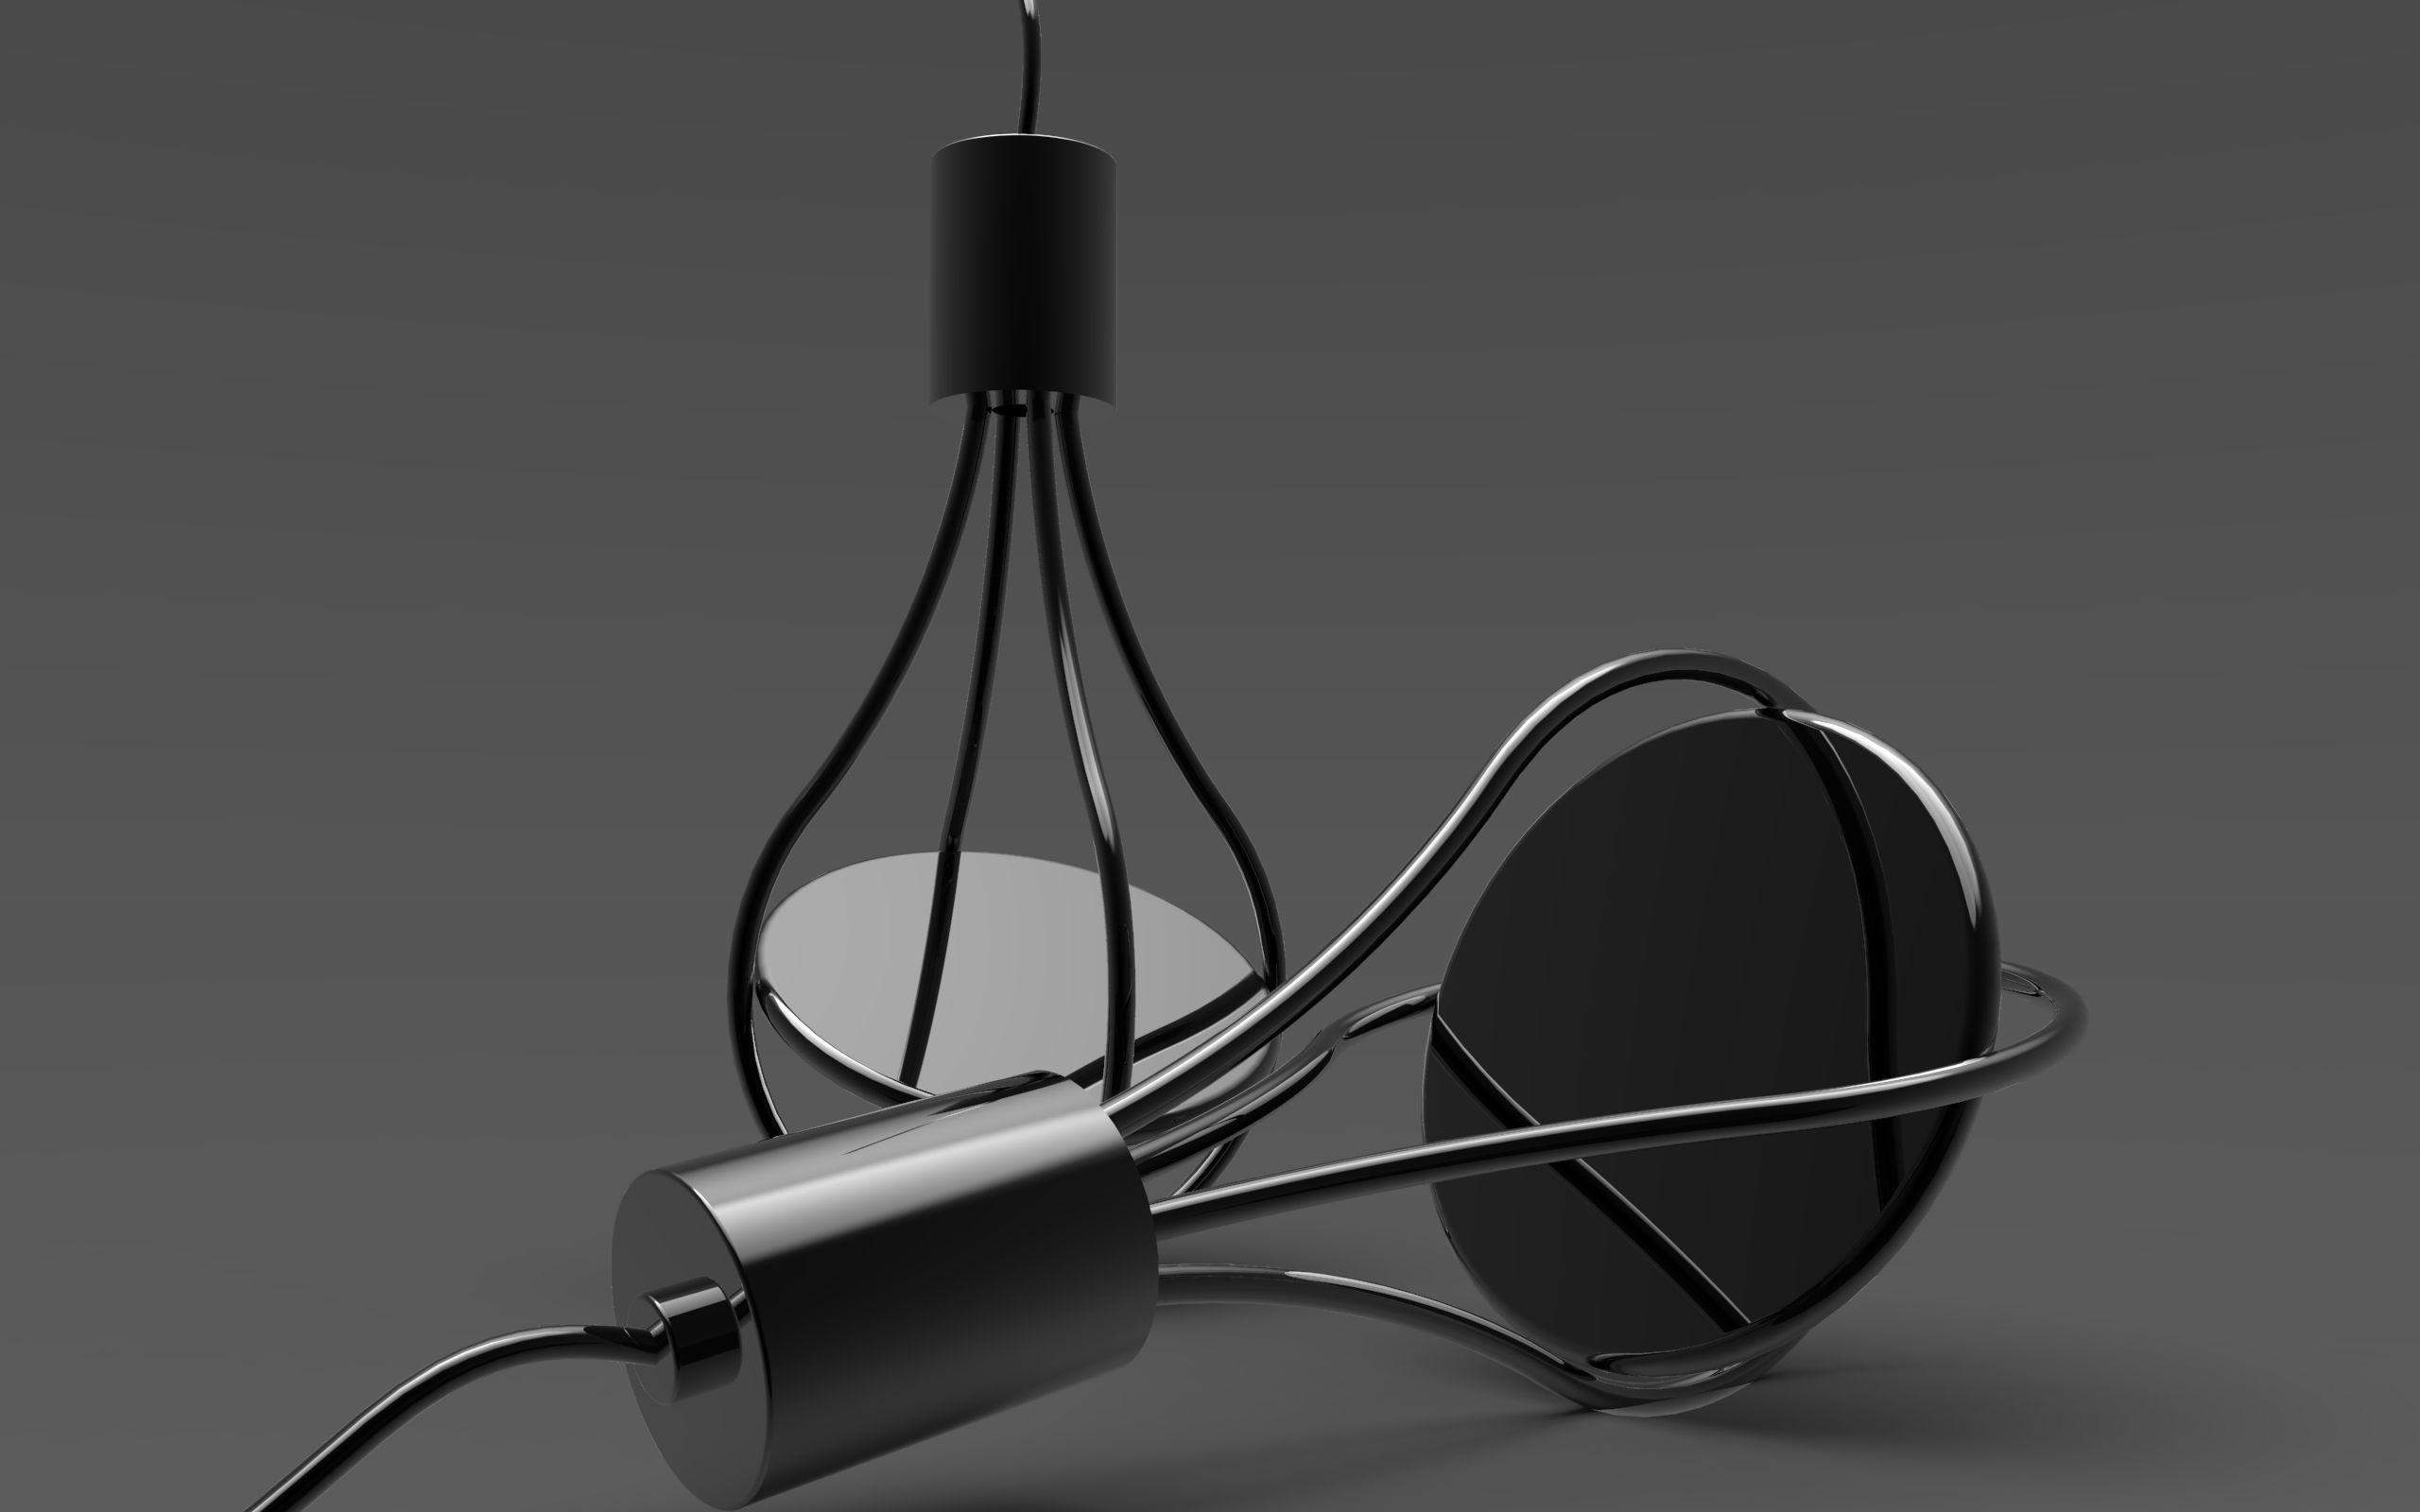 Lamp-l10f-pro9-3500-3500